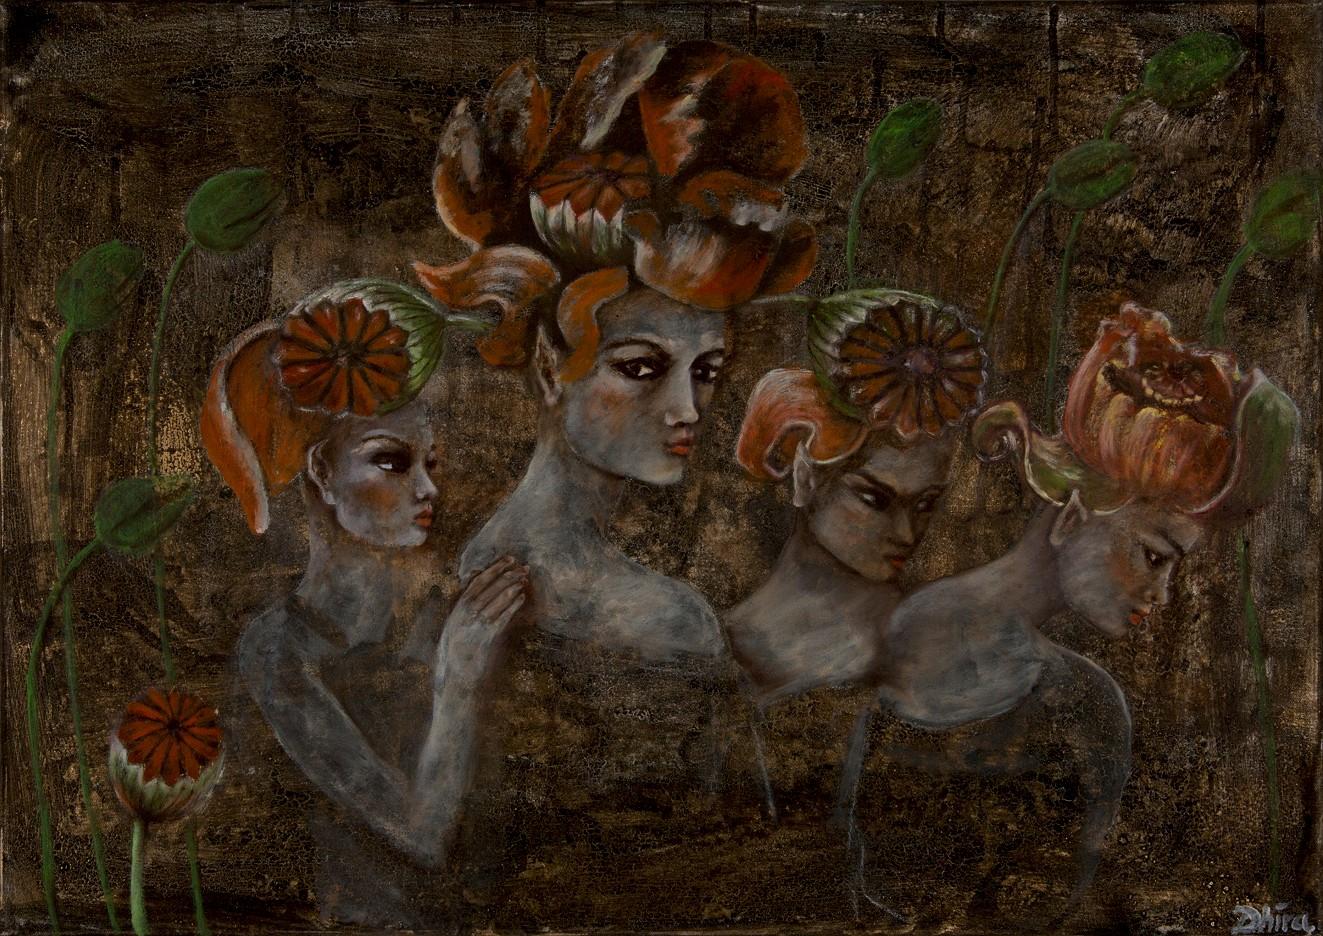 Die Mohnfrauen